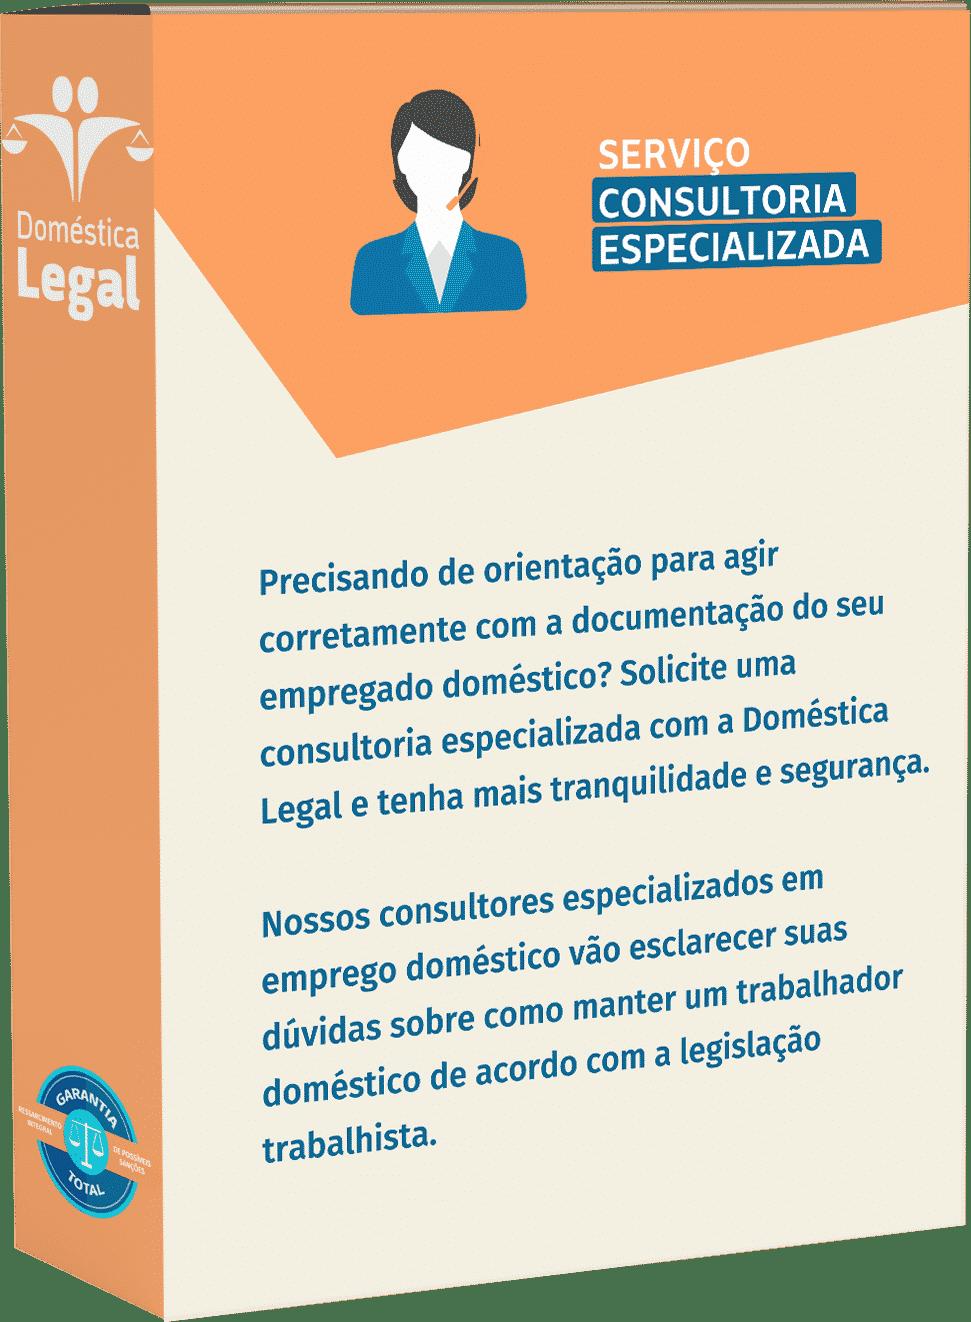 mockup_Consultoria_especializada